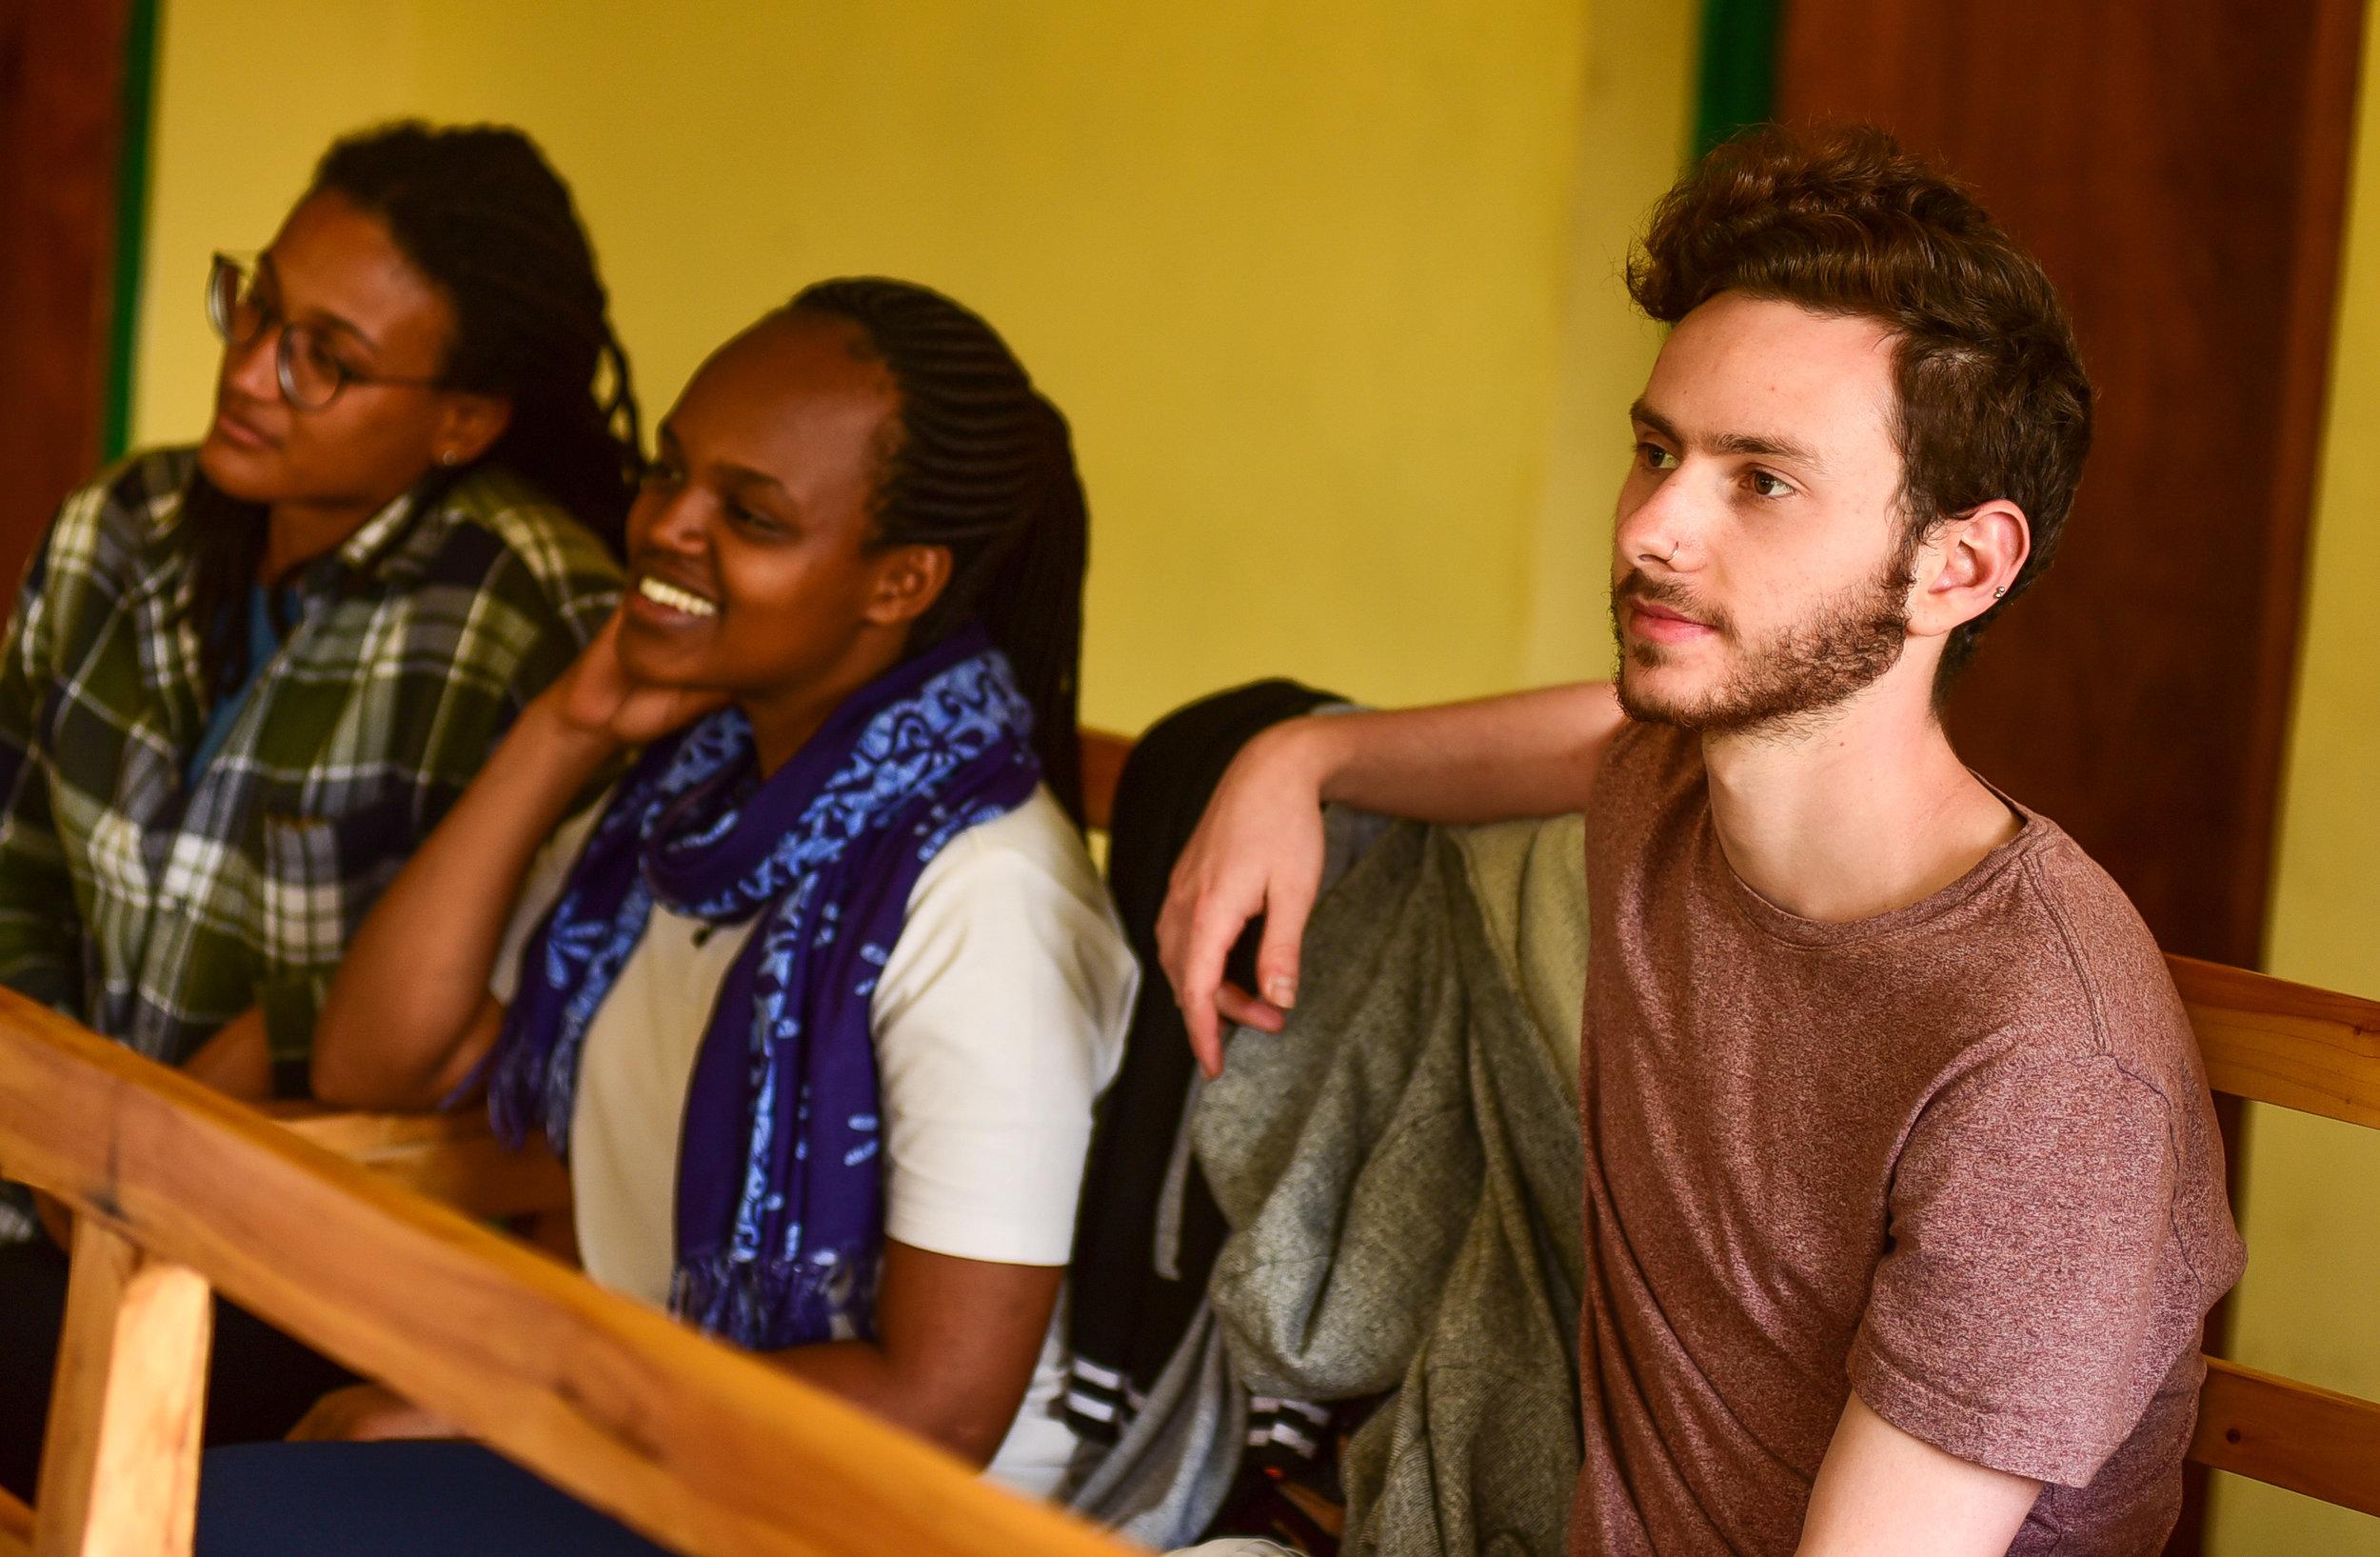 Attending an ANC training in Karwasa, Musanze. Photo by Maggie Andresen.